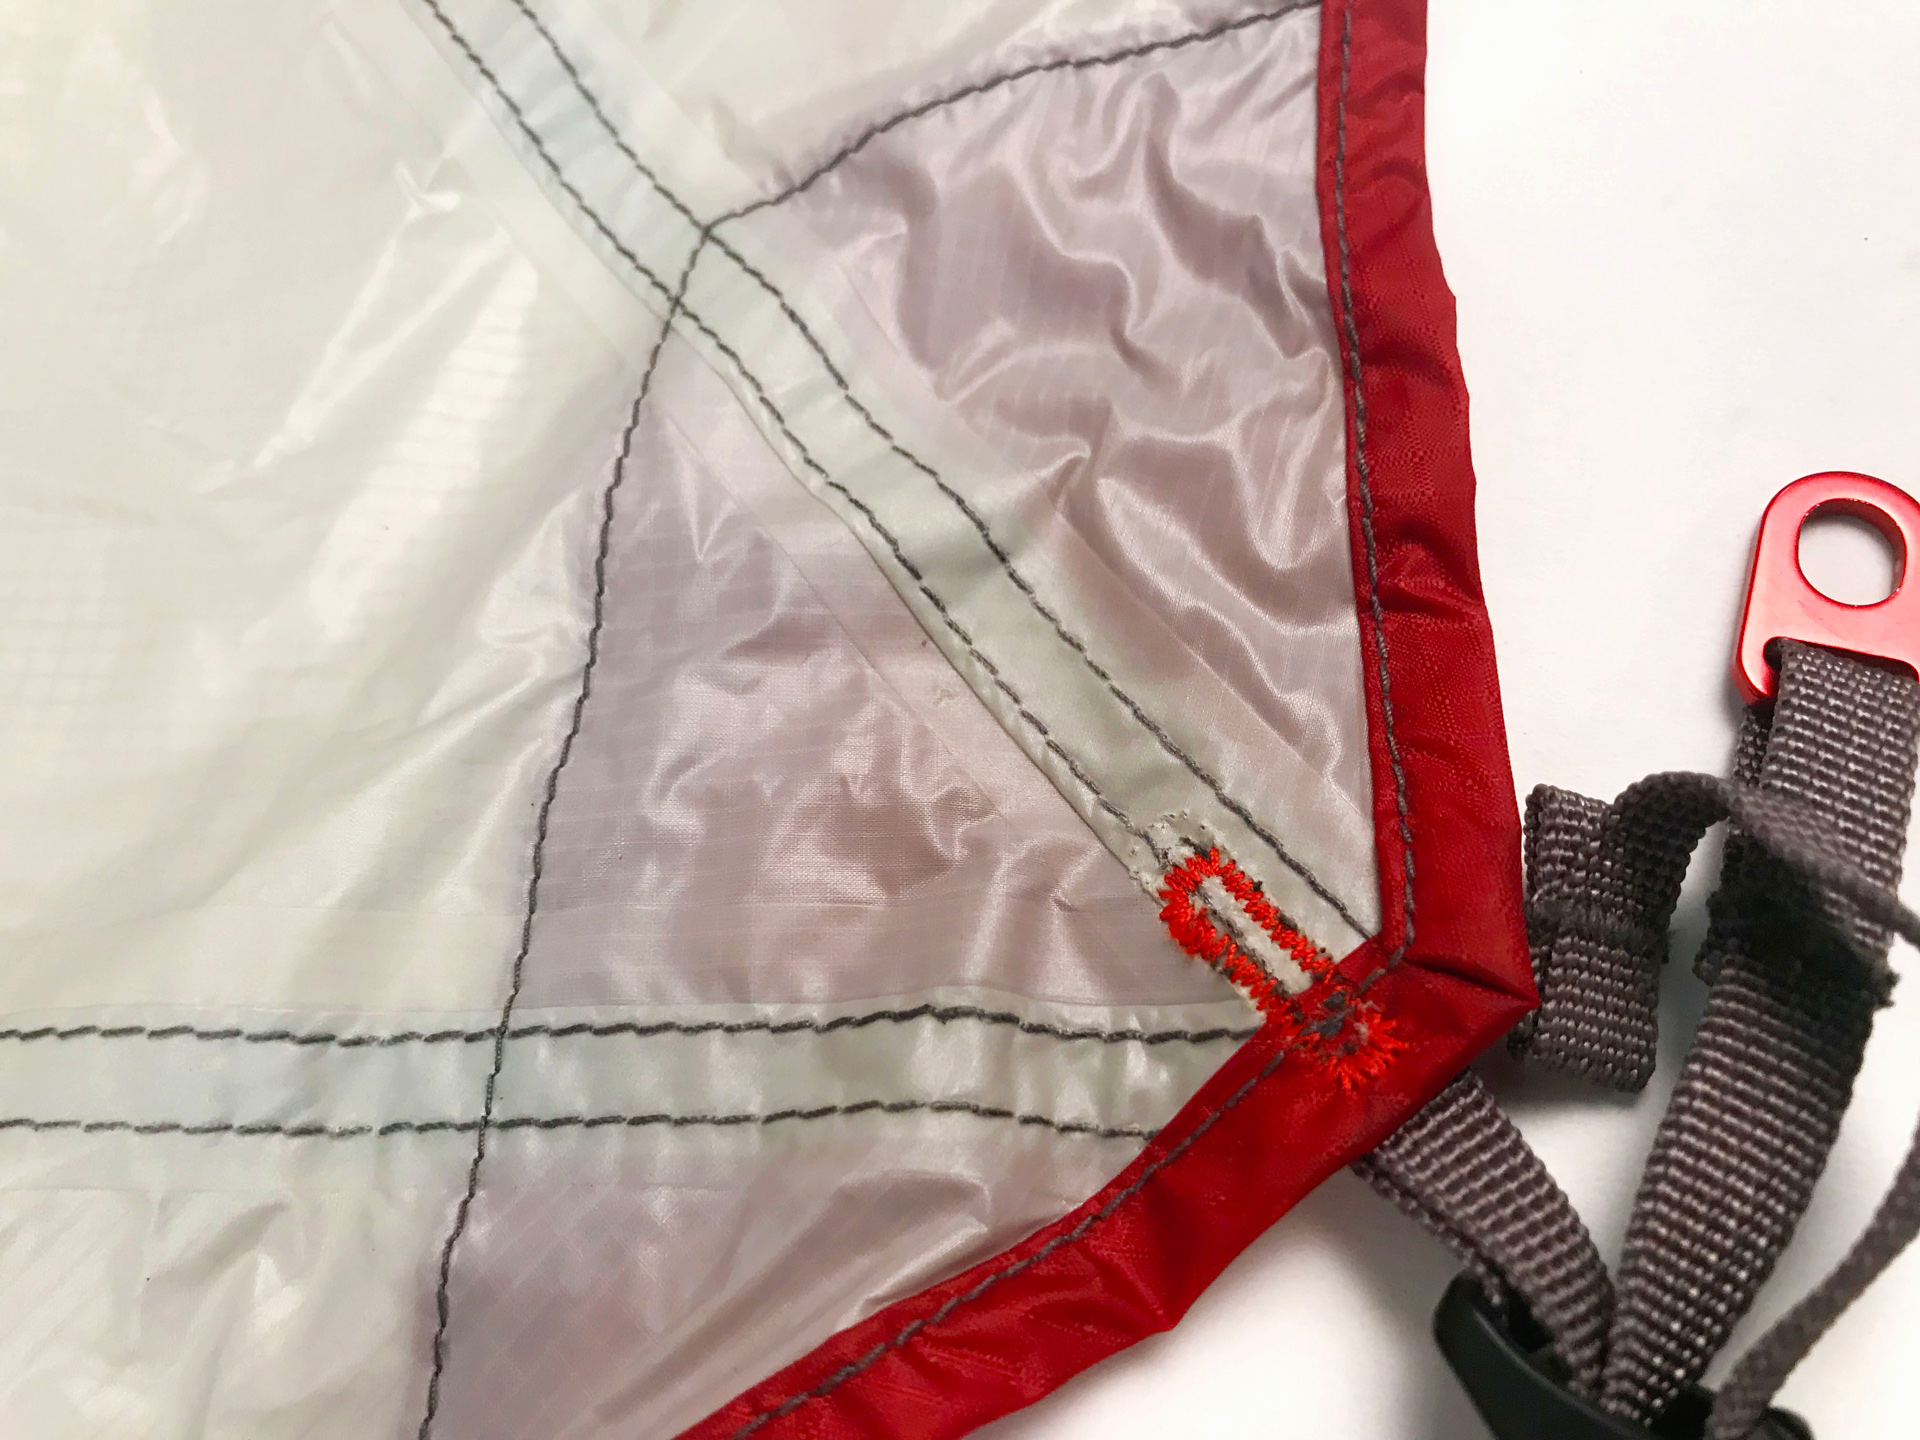 MSR Blog Seam Taping vs Seam Sealing Tent Care 101